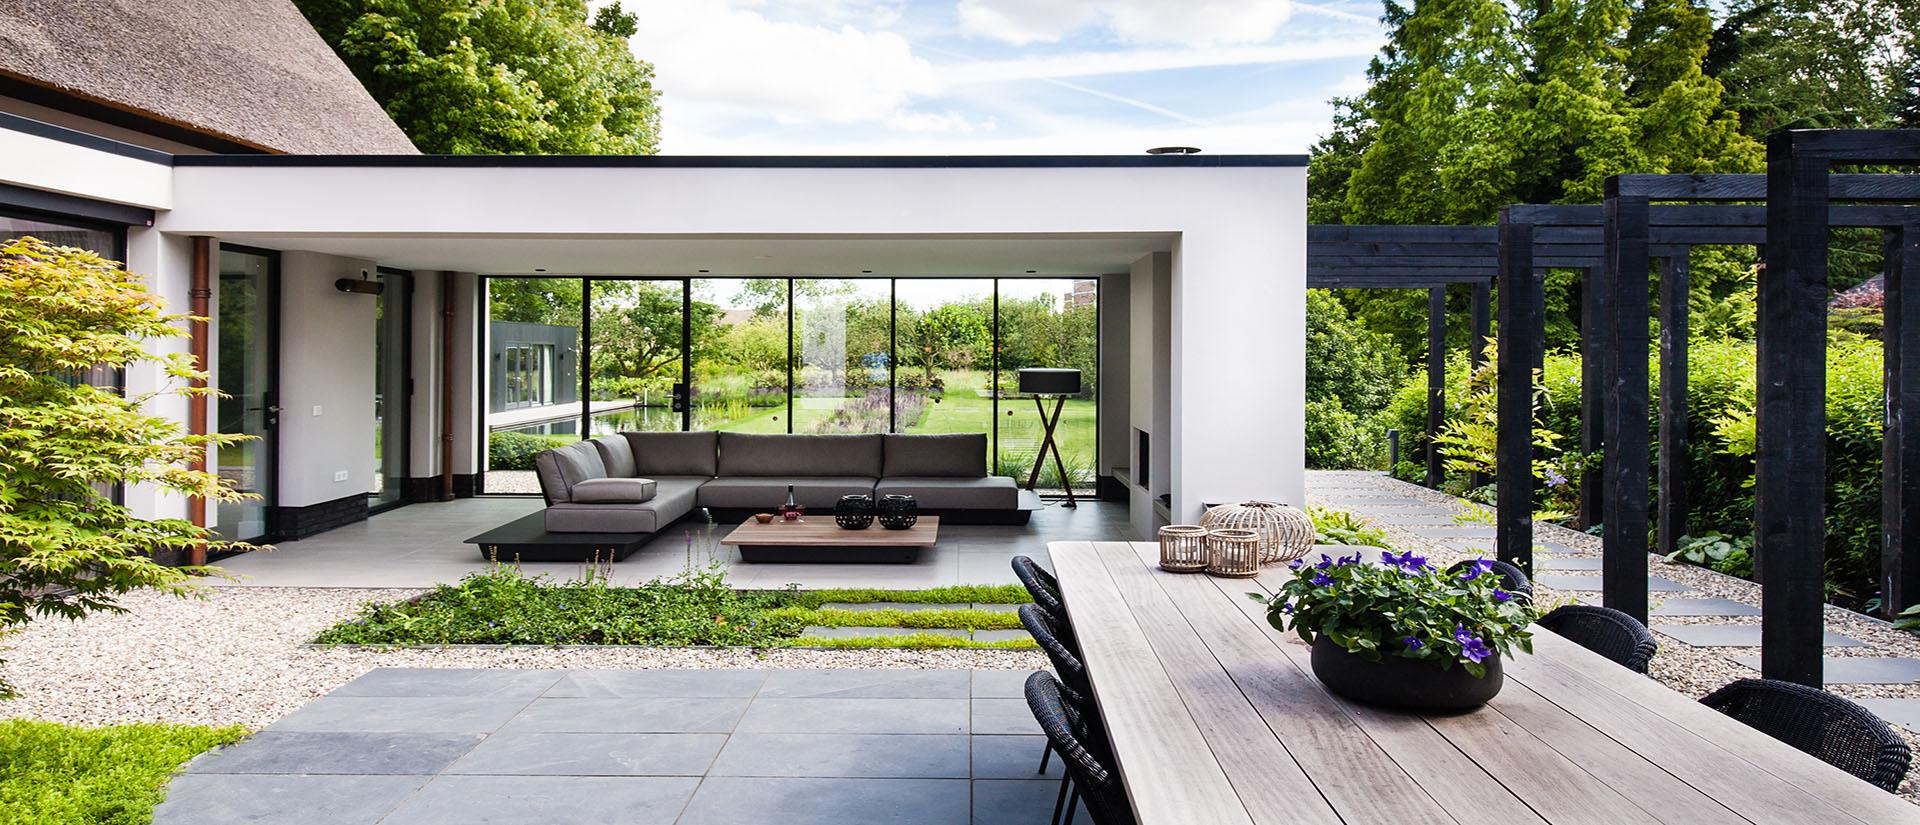 Tuin_in_Capelle_aan_den_IJssel_villatuin_moderne_tuin_binnentuin